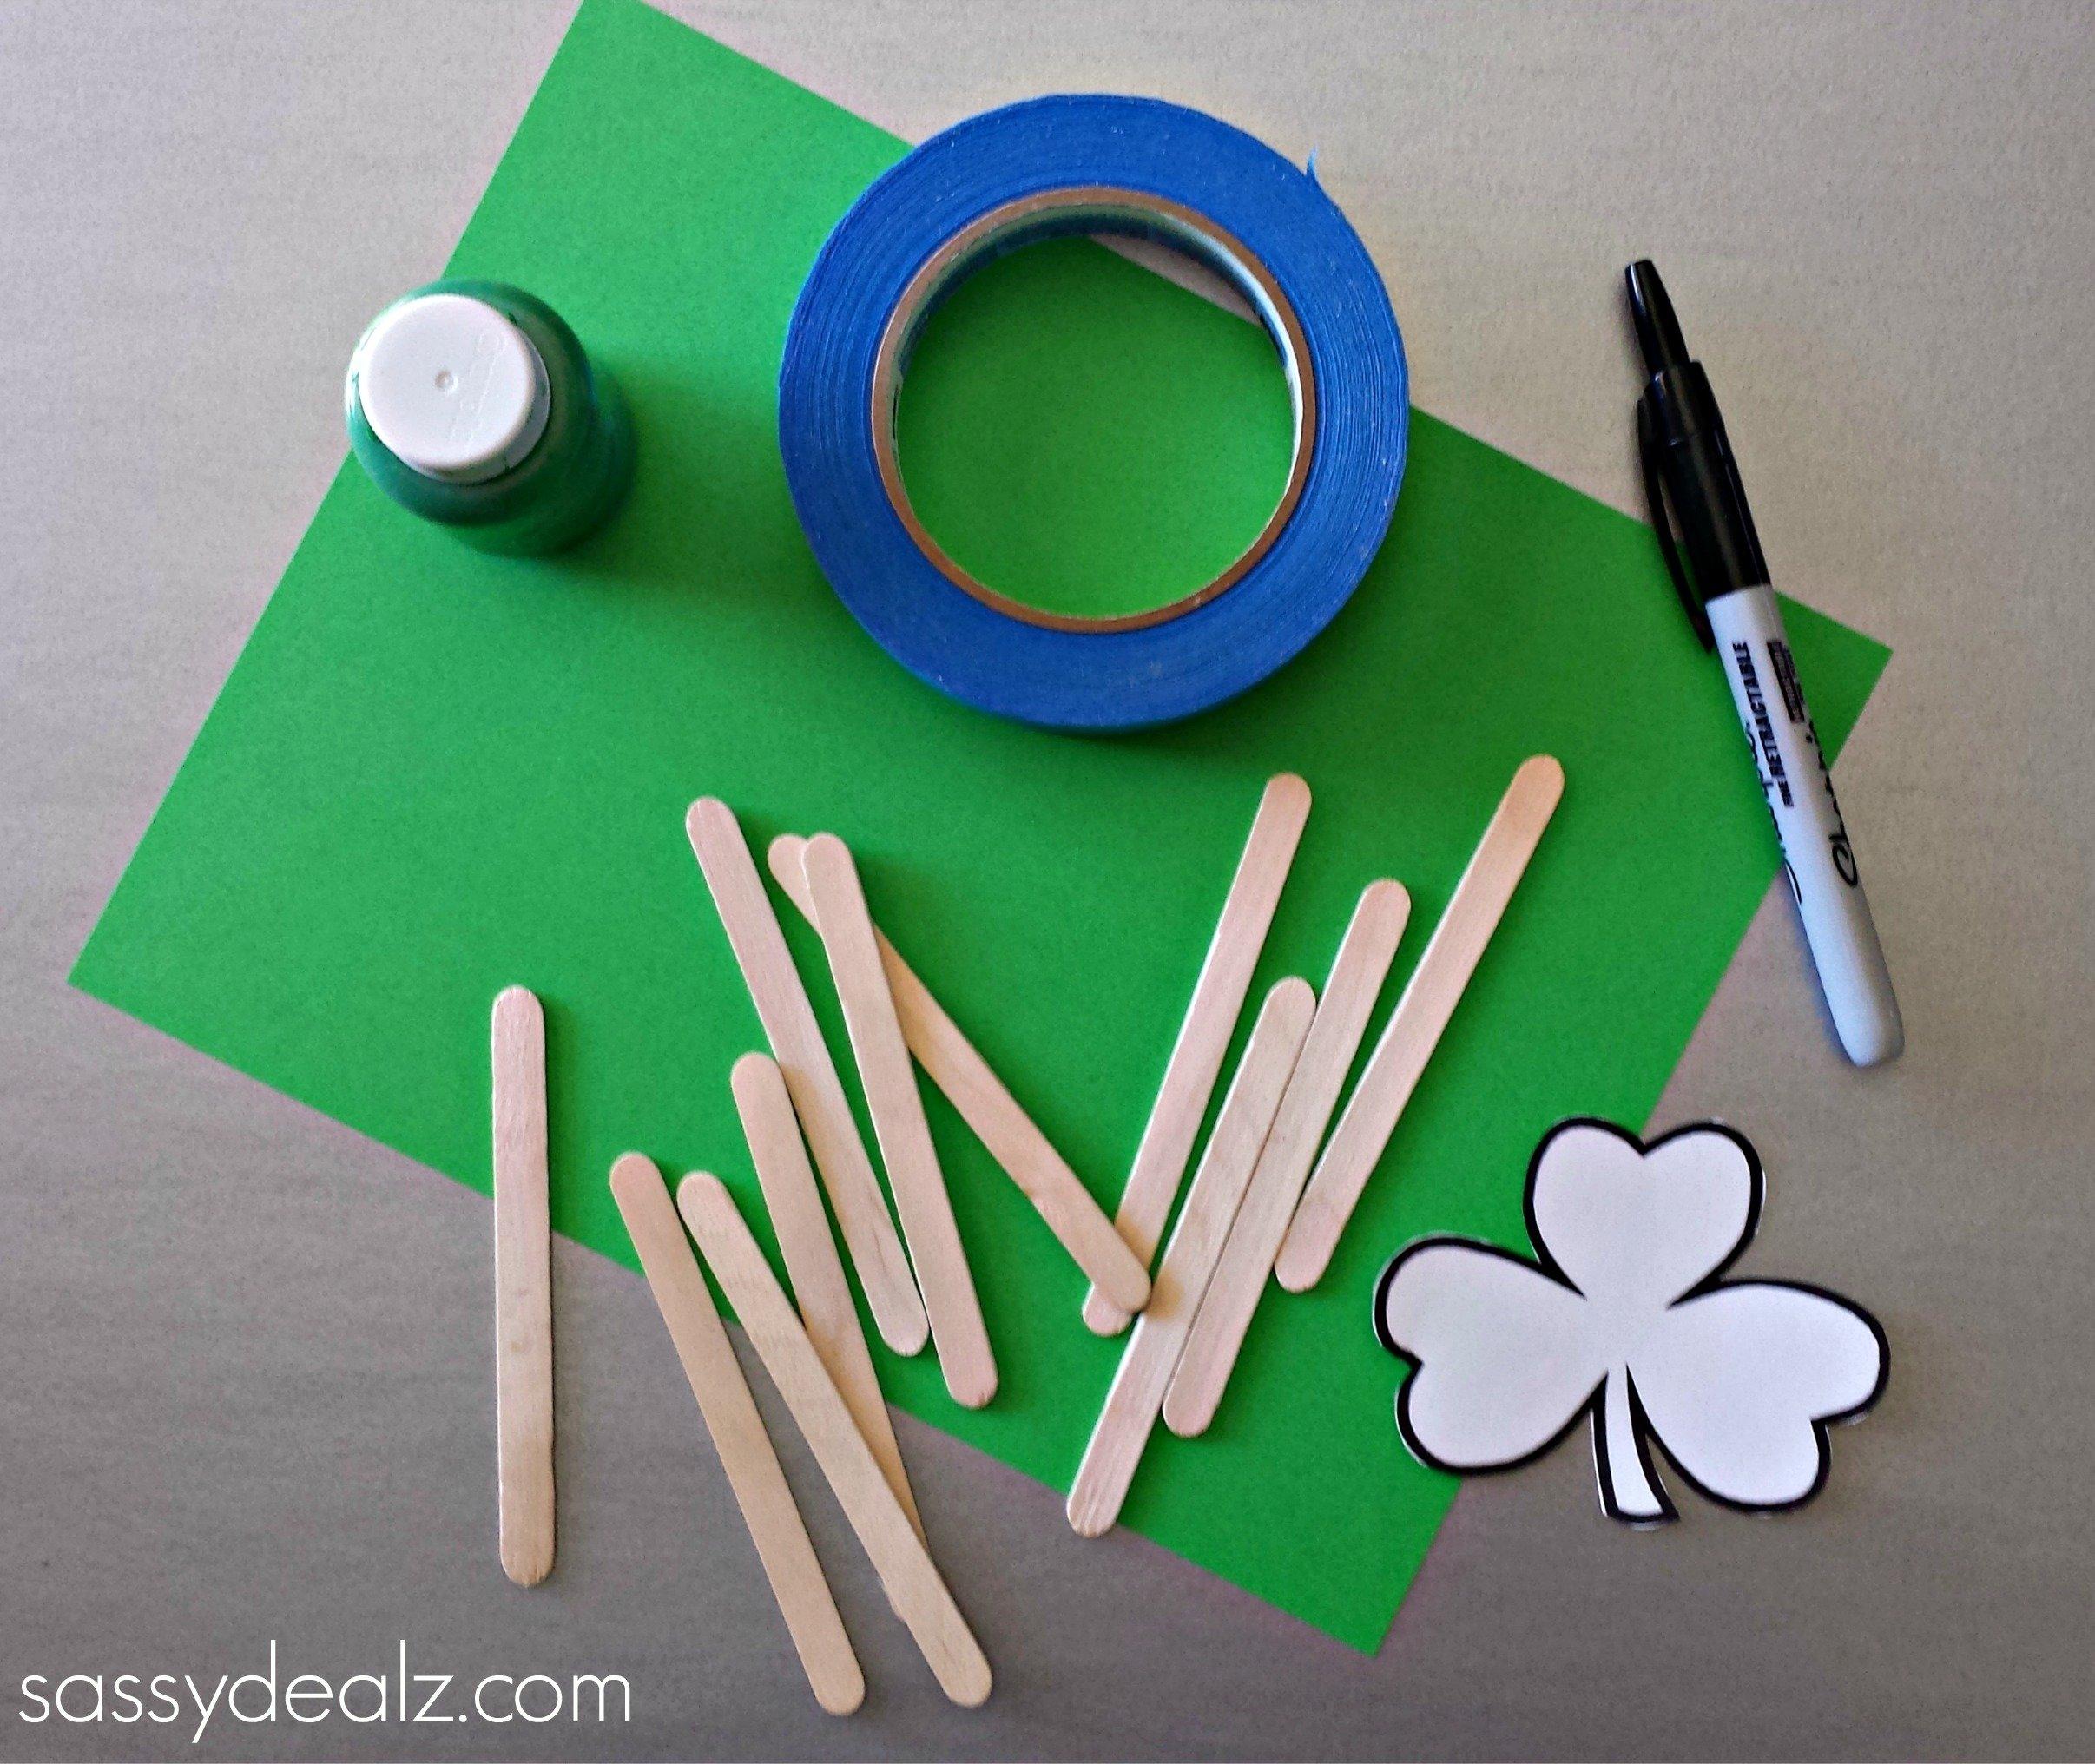 10 Lovable St Patricks Day Craft Ideas st patricks day popsicle stick craft diy puzzles crafty morning 1 2020